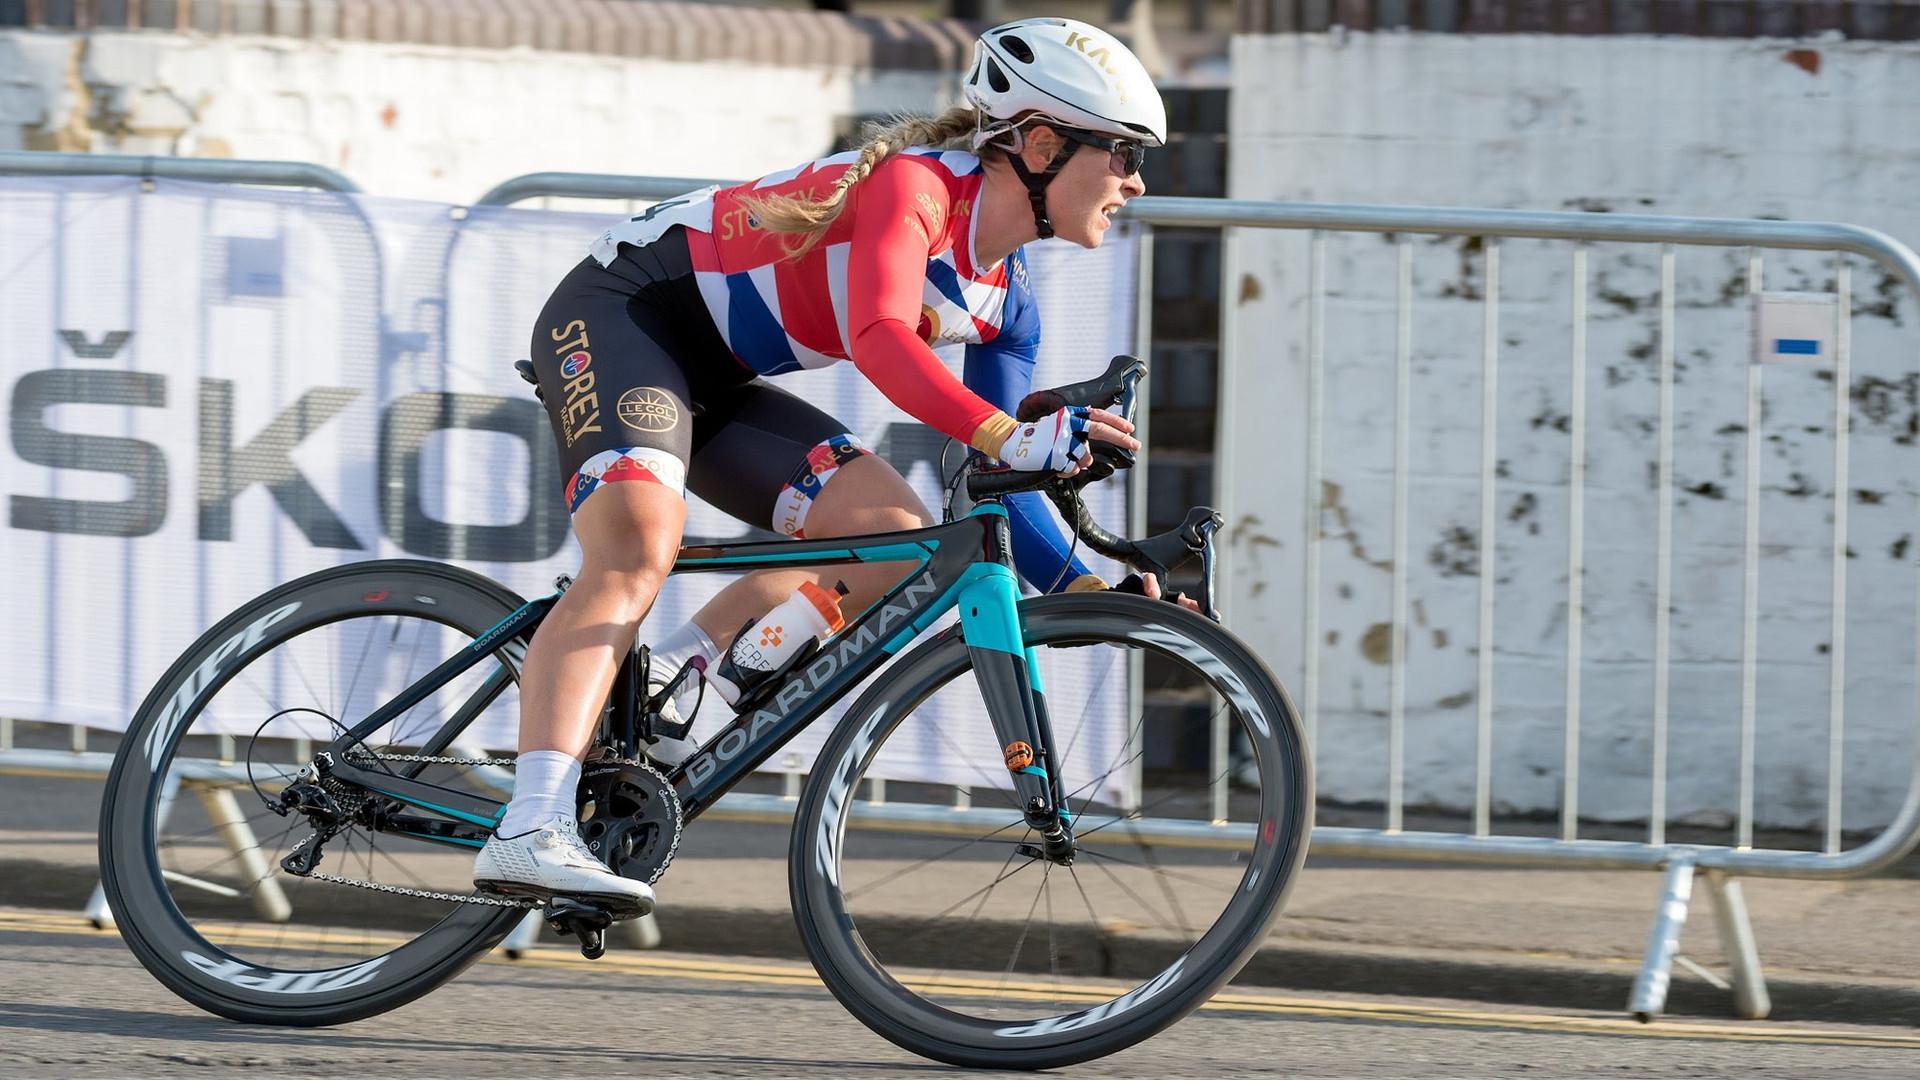 luxury cycle retreat training camp in denia calpe mallorca spain with bike hire